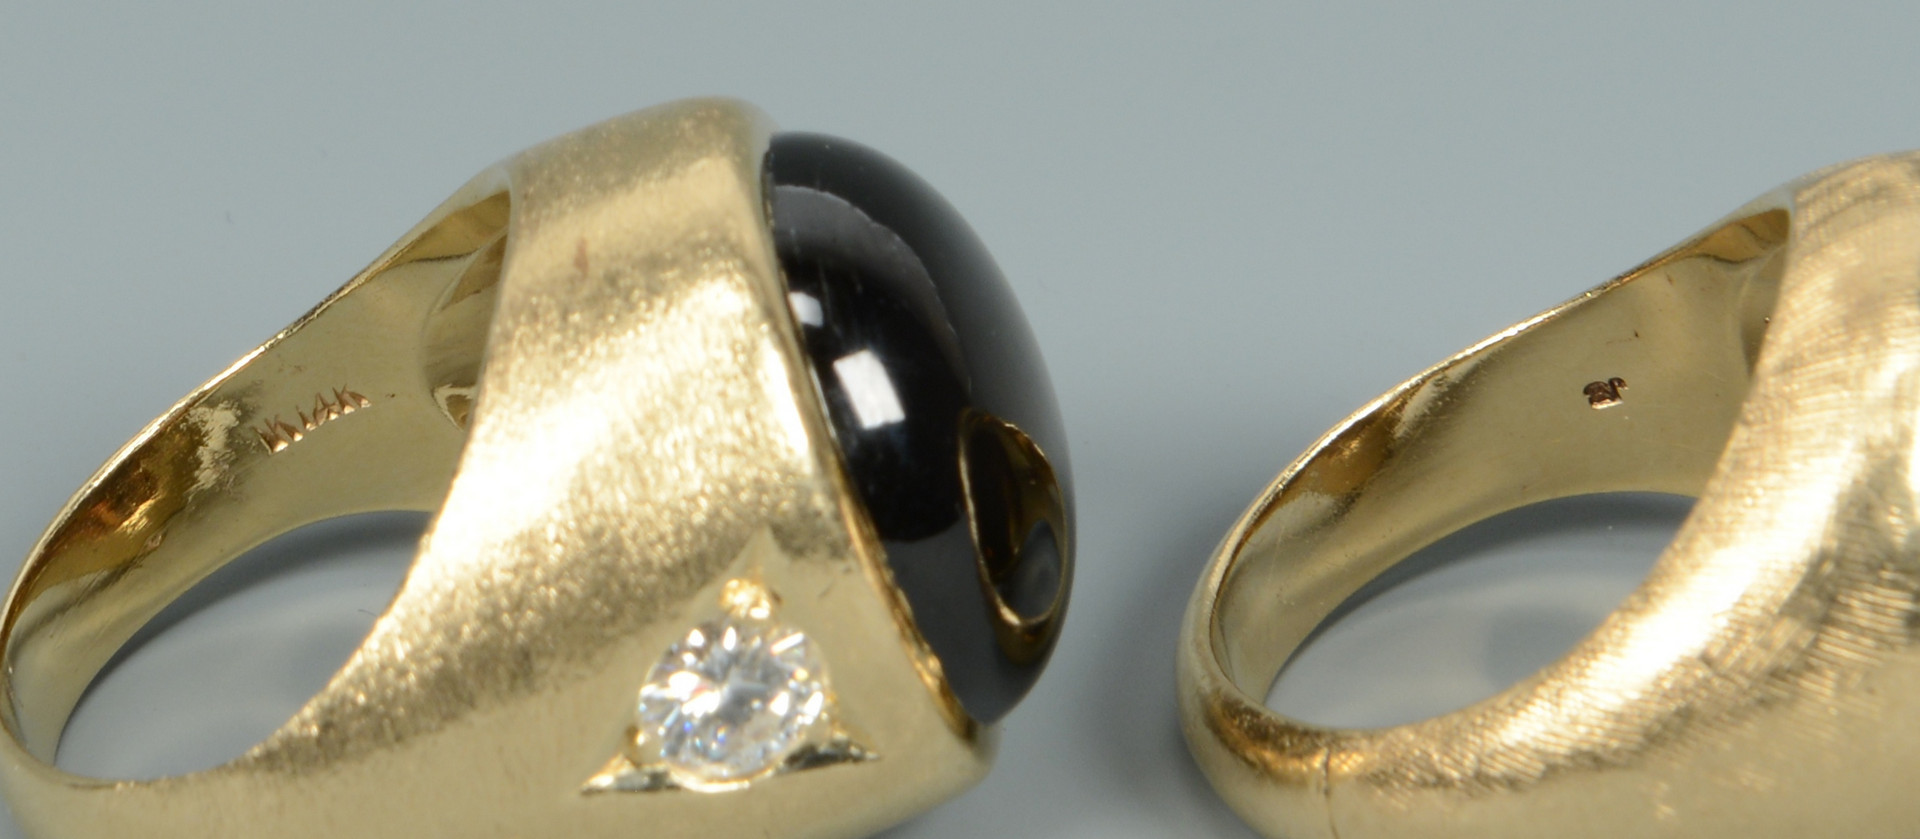 Lot 496: 2 Gents 14k Black Star Sapphire Rings